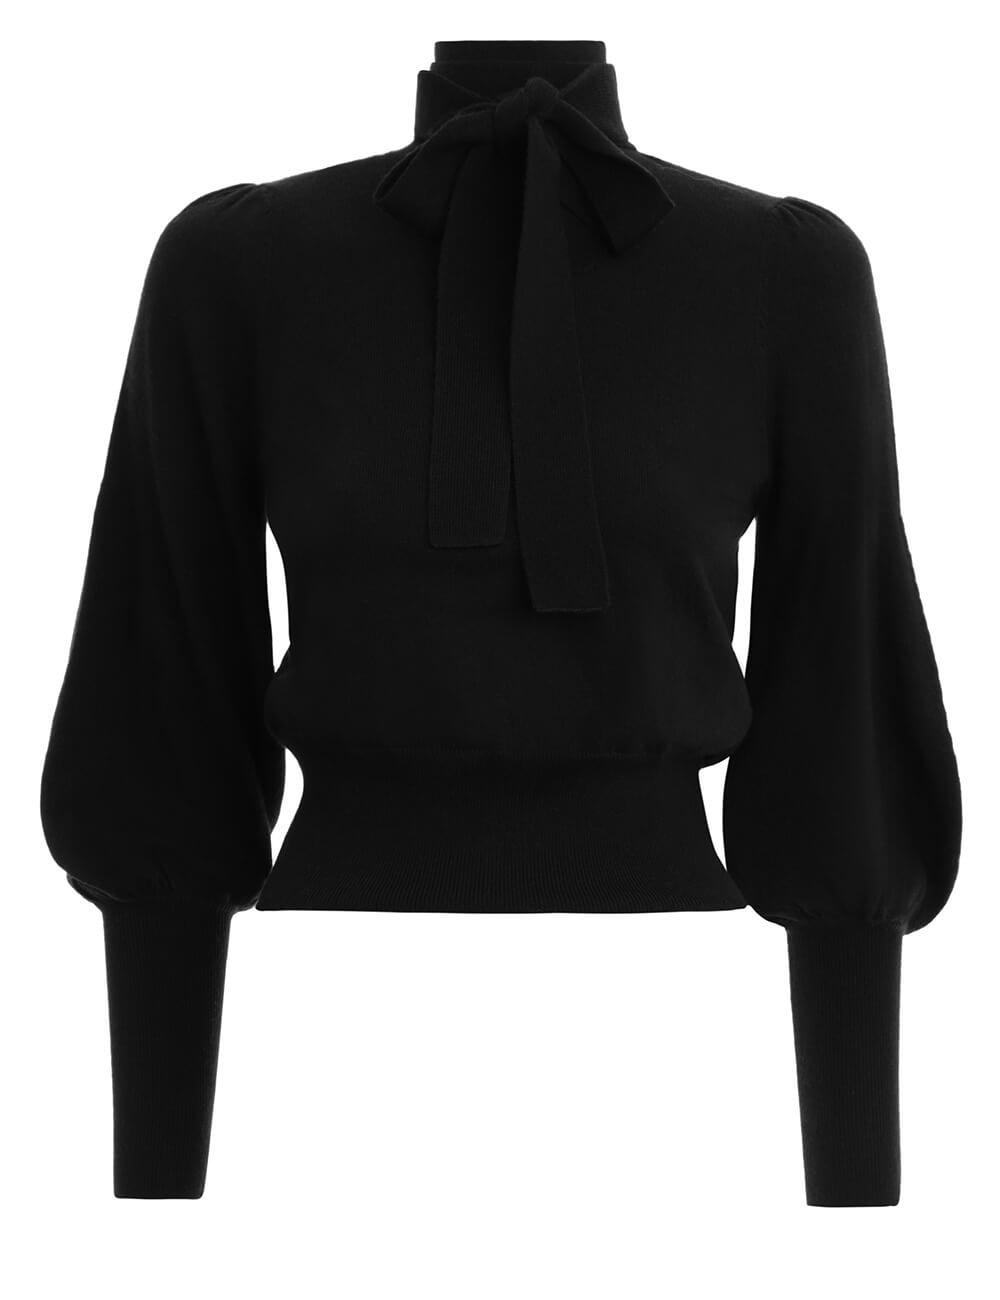 Espionage Neck Tie Sweater